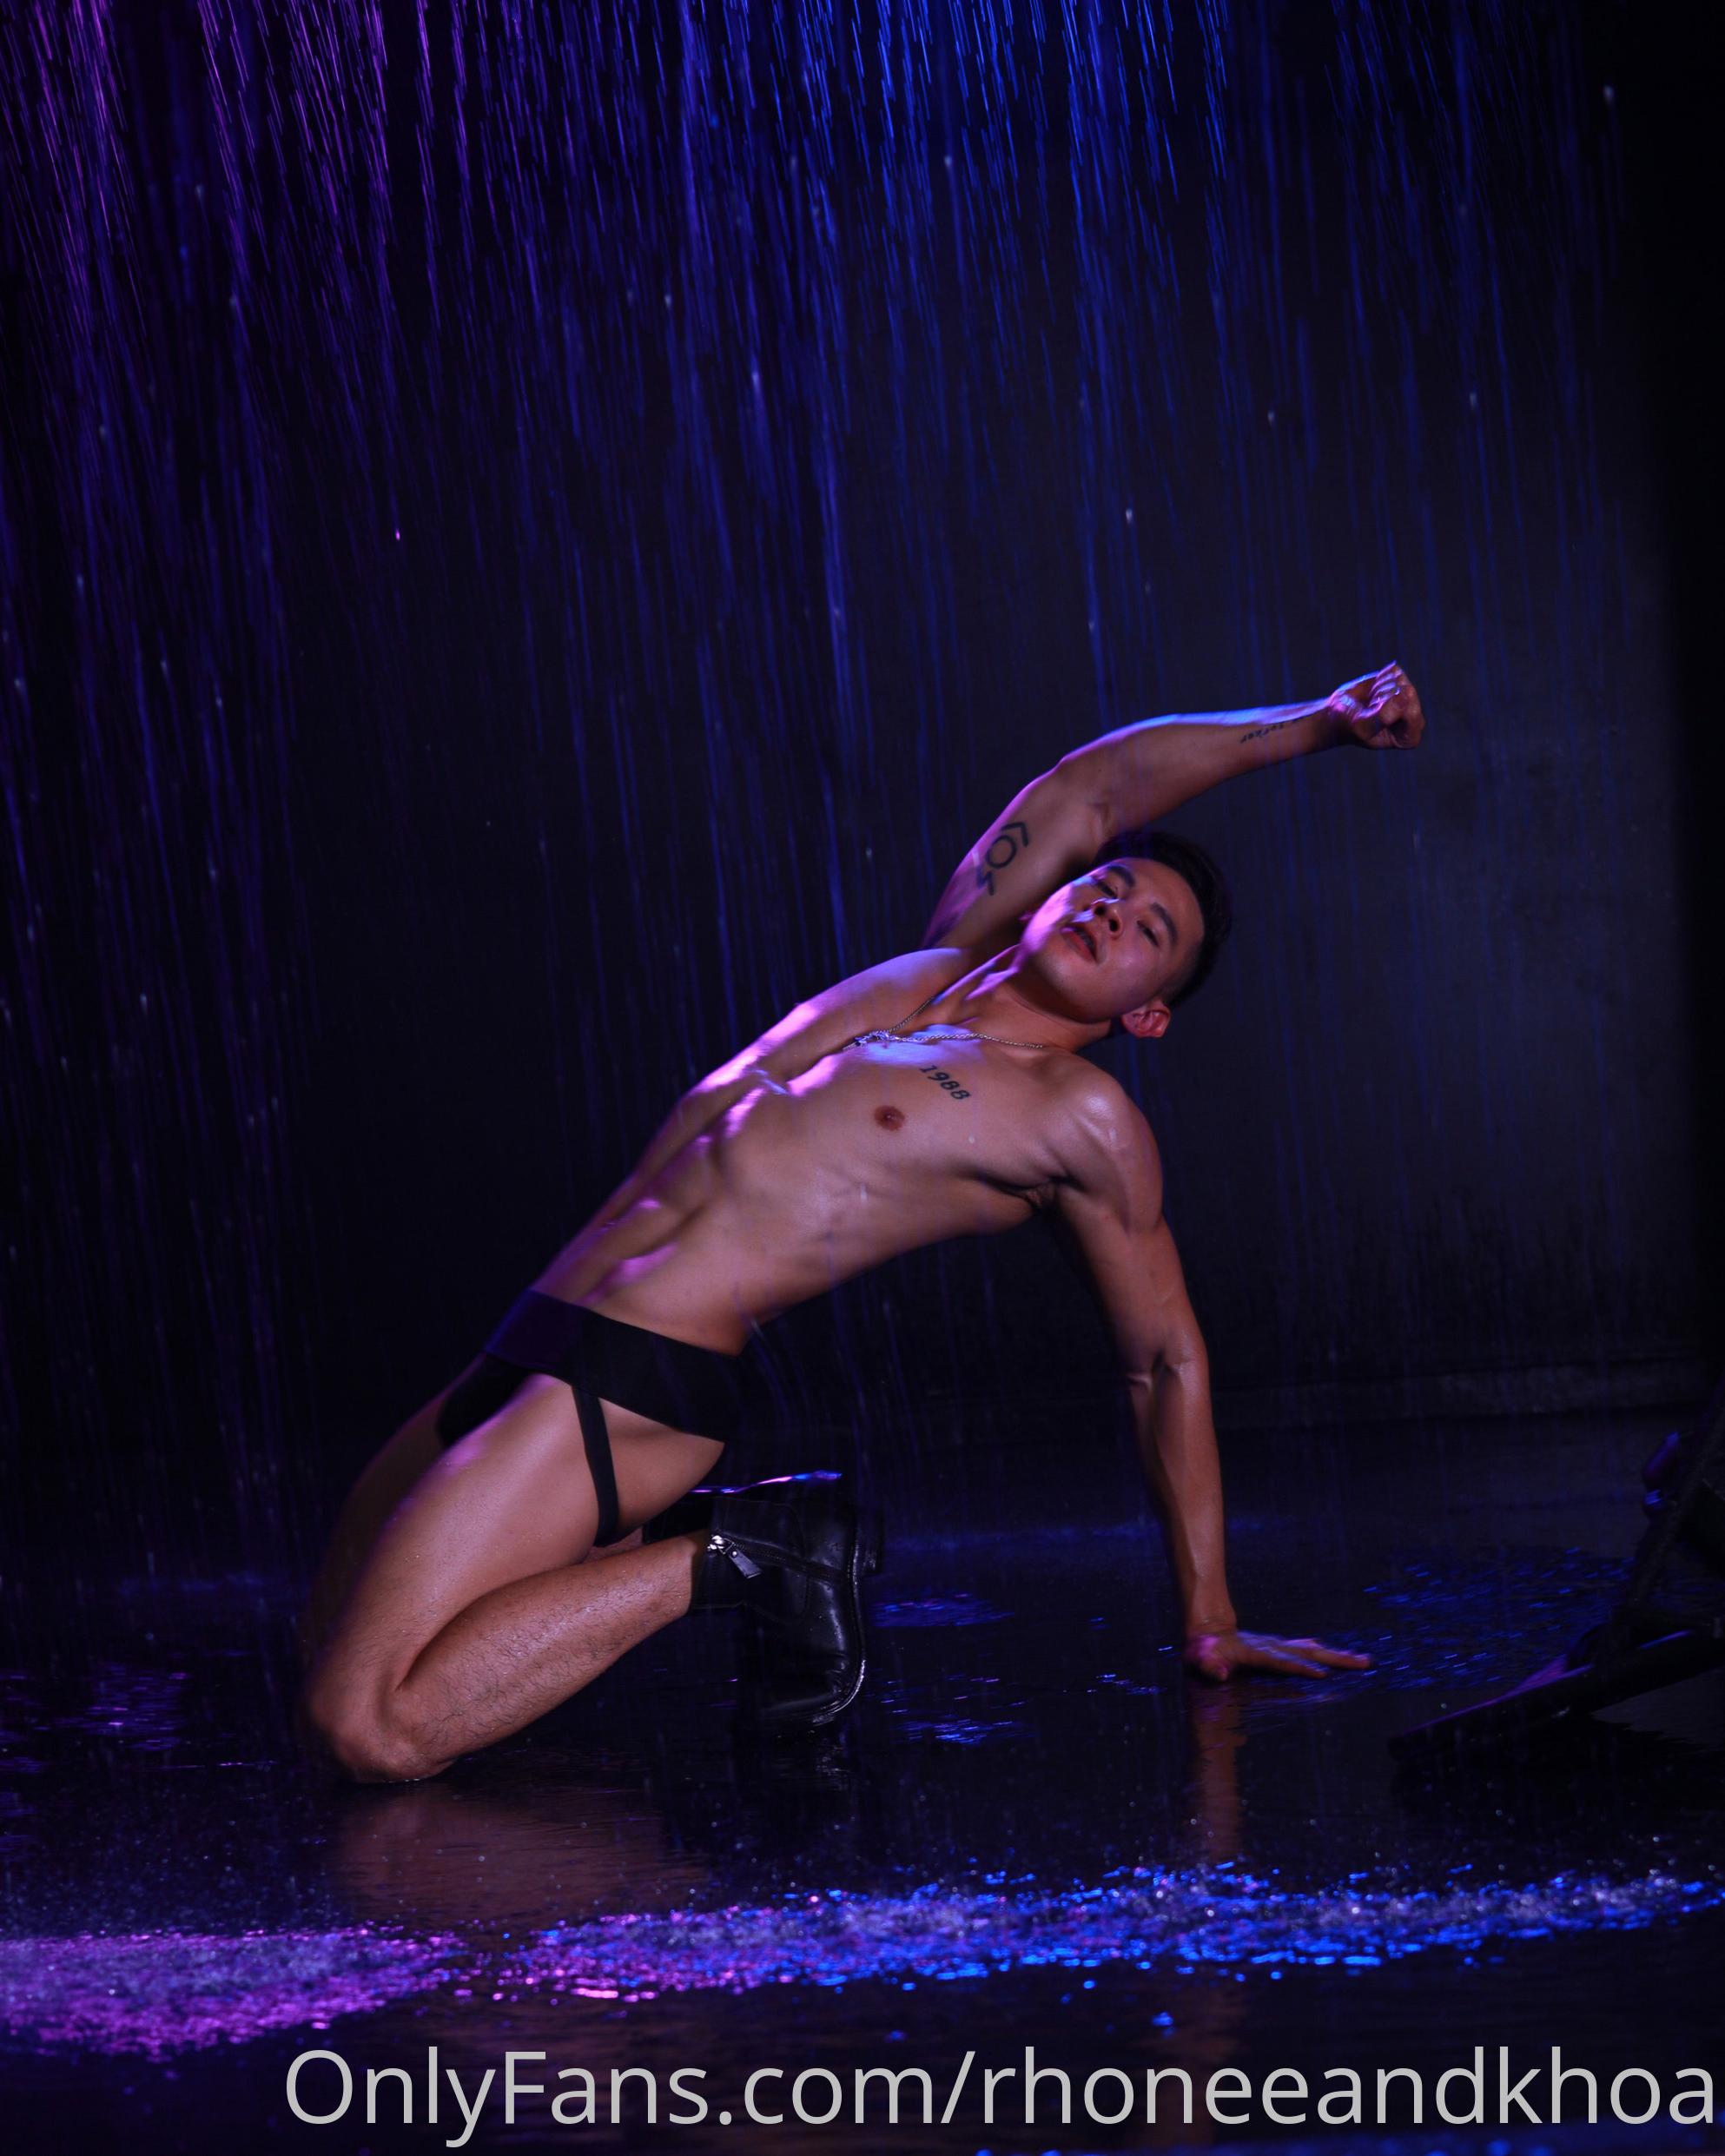 Hồ Vĩnh Khoa & Rhonee Rojas - Make Me Wet (Non-sex)